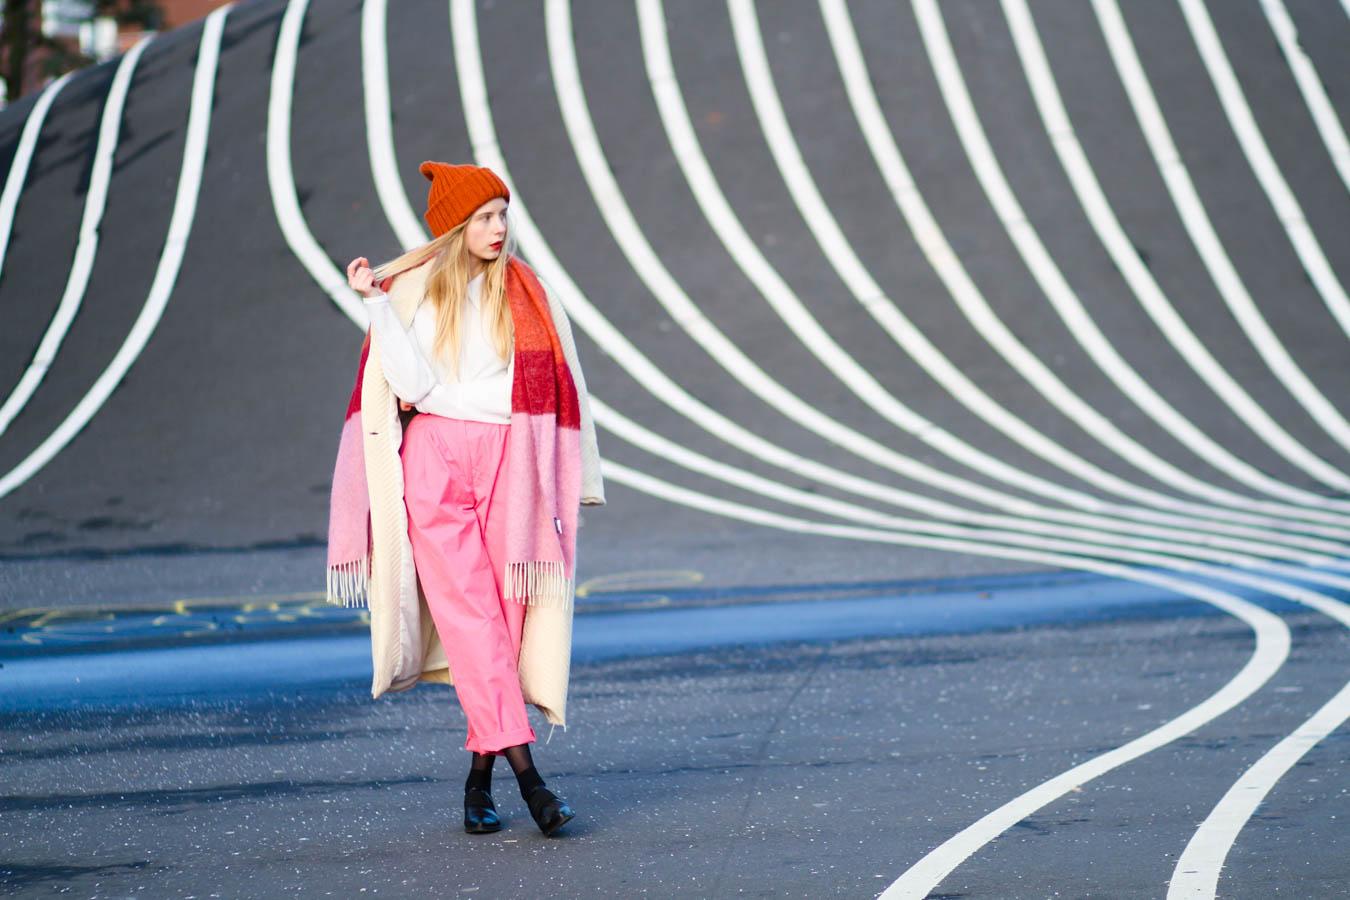 outfit january nemesis babe marie jensen danish blogger -1